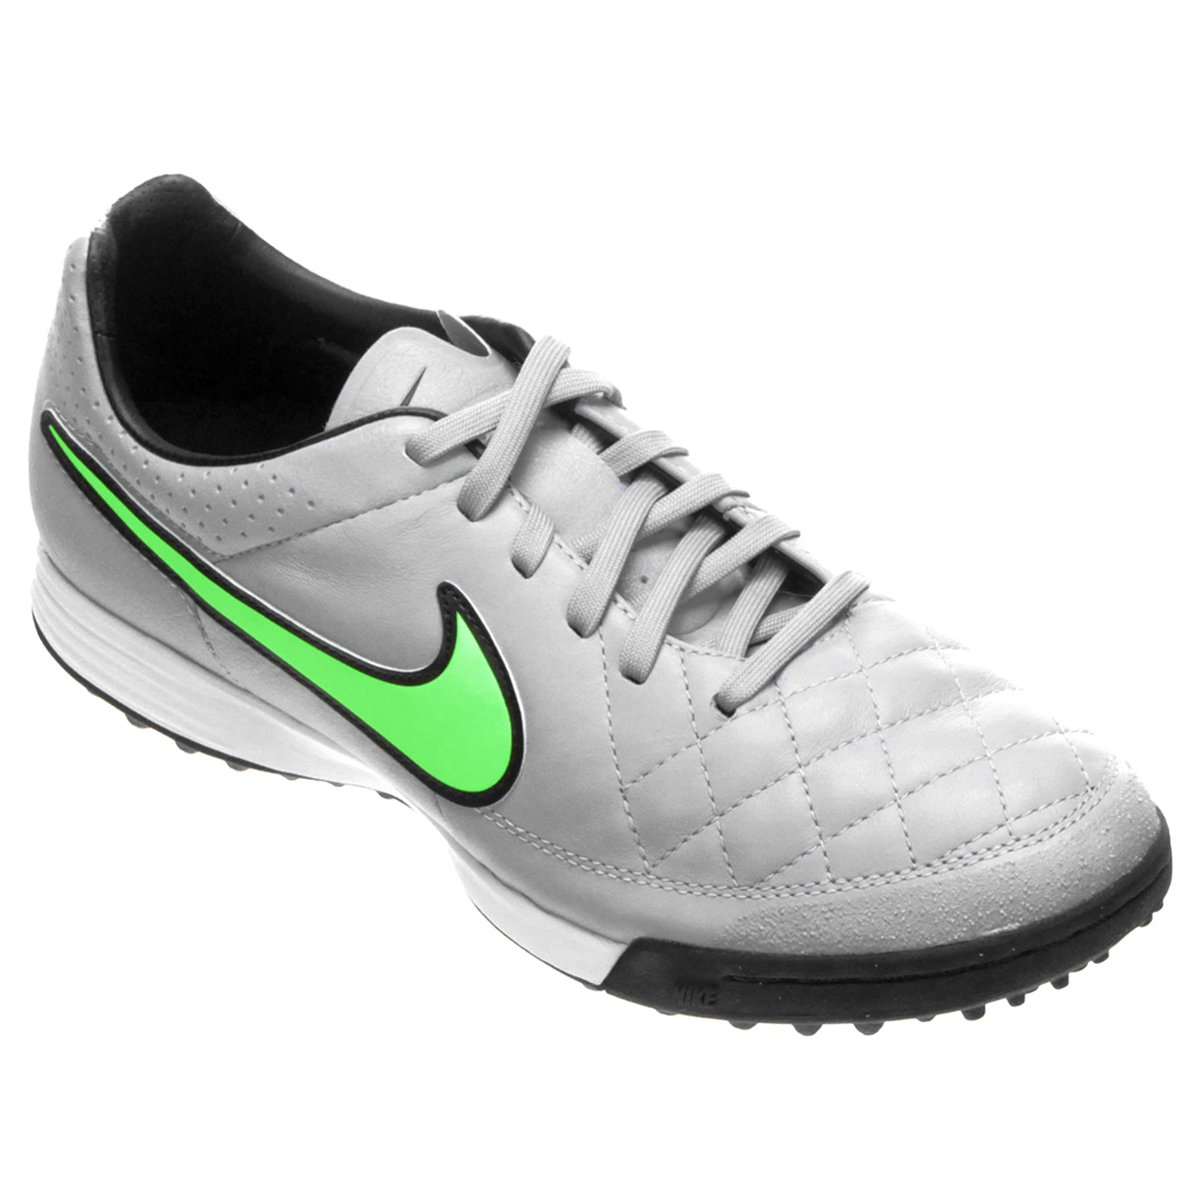 4ff4a96e96 Chuteira Nike Tiempo Legacy TF - Compre Agora